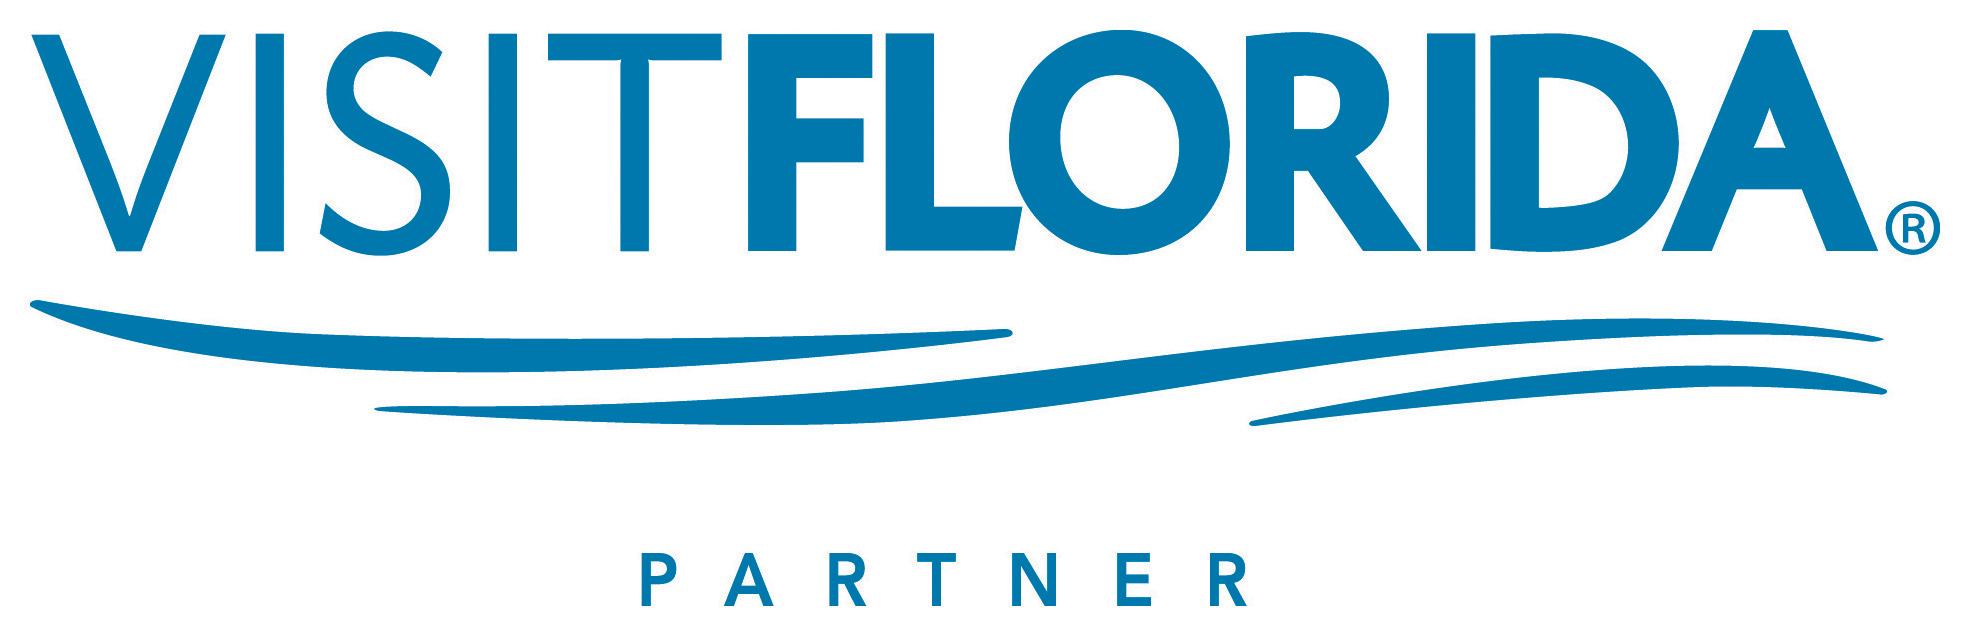 VisitFlorida Partner Logo Blue